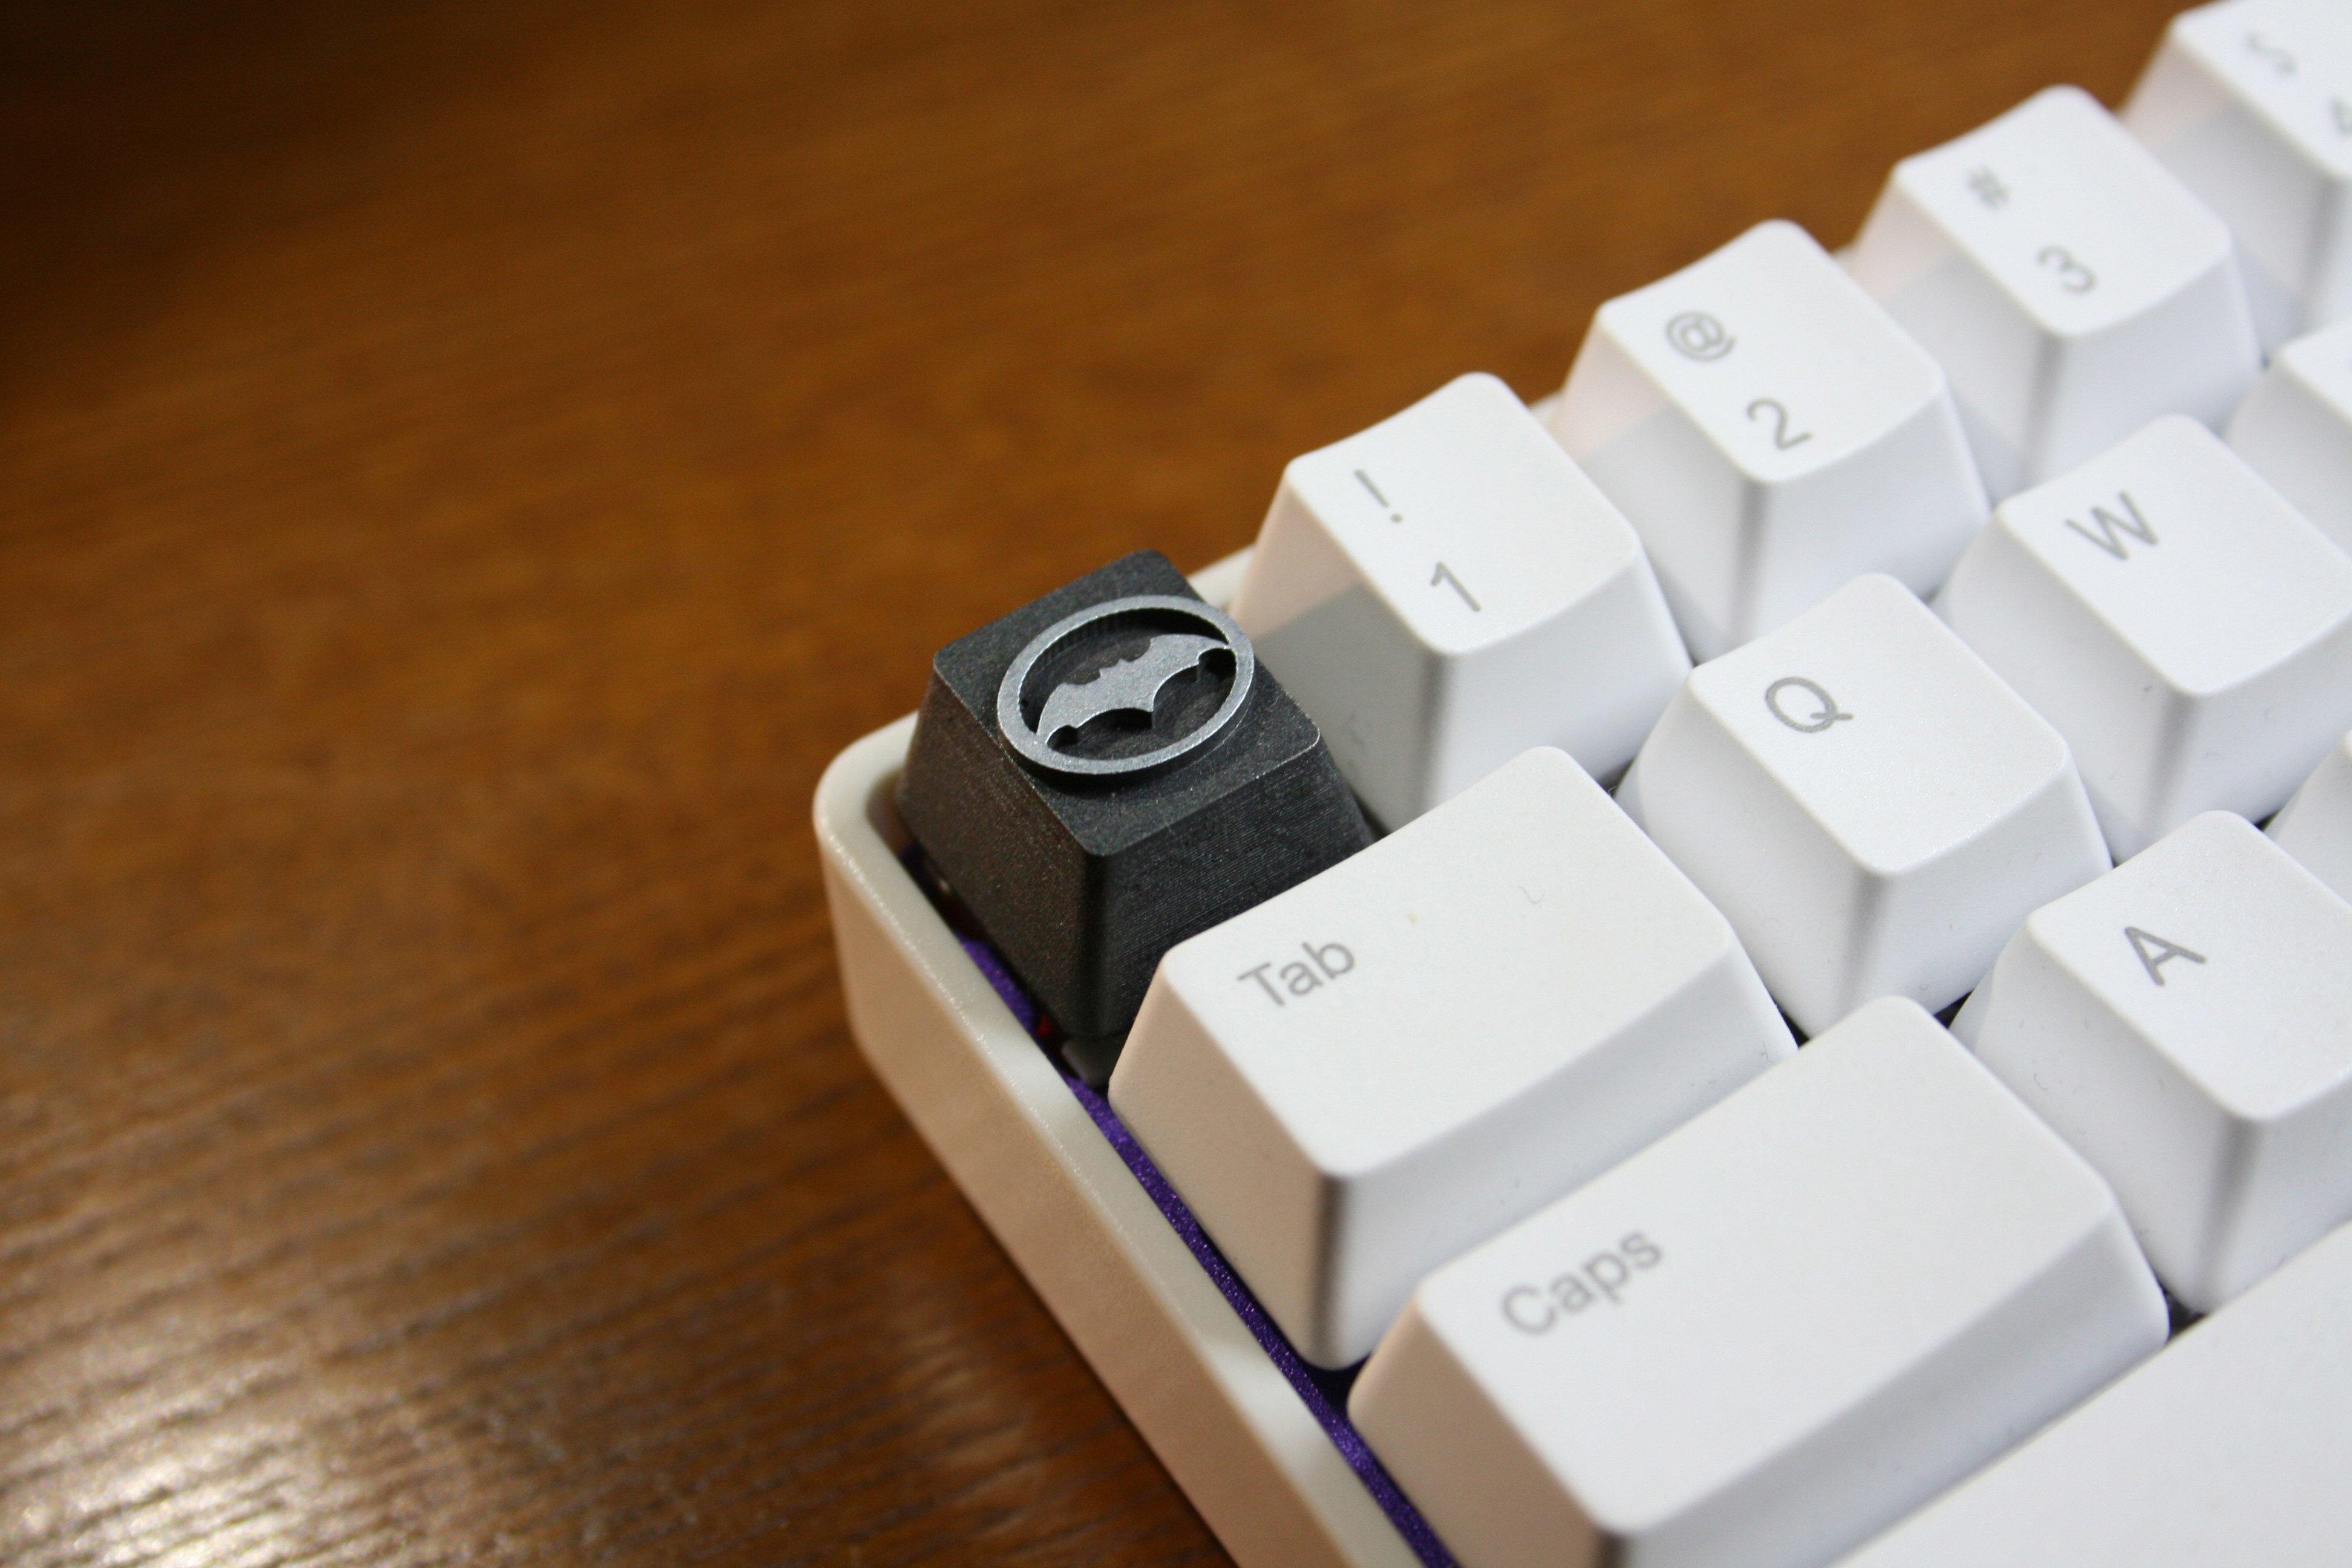 Avengers S.H.I.E.L.D Aluminium Artisan Keycap For Cherry MX Switches